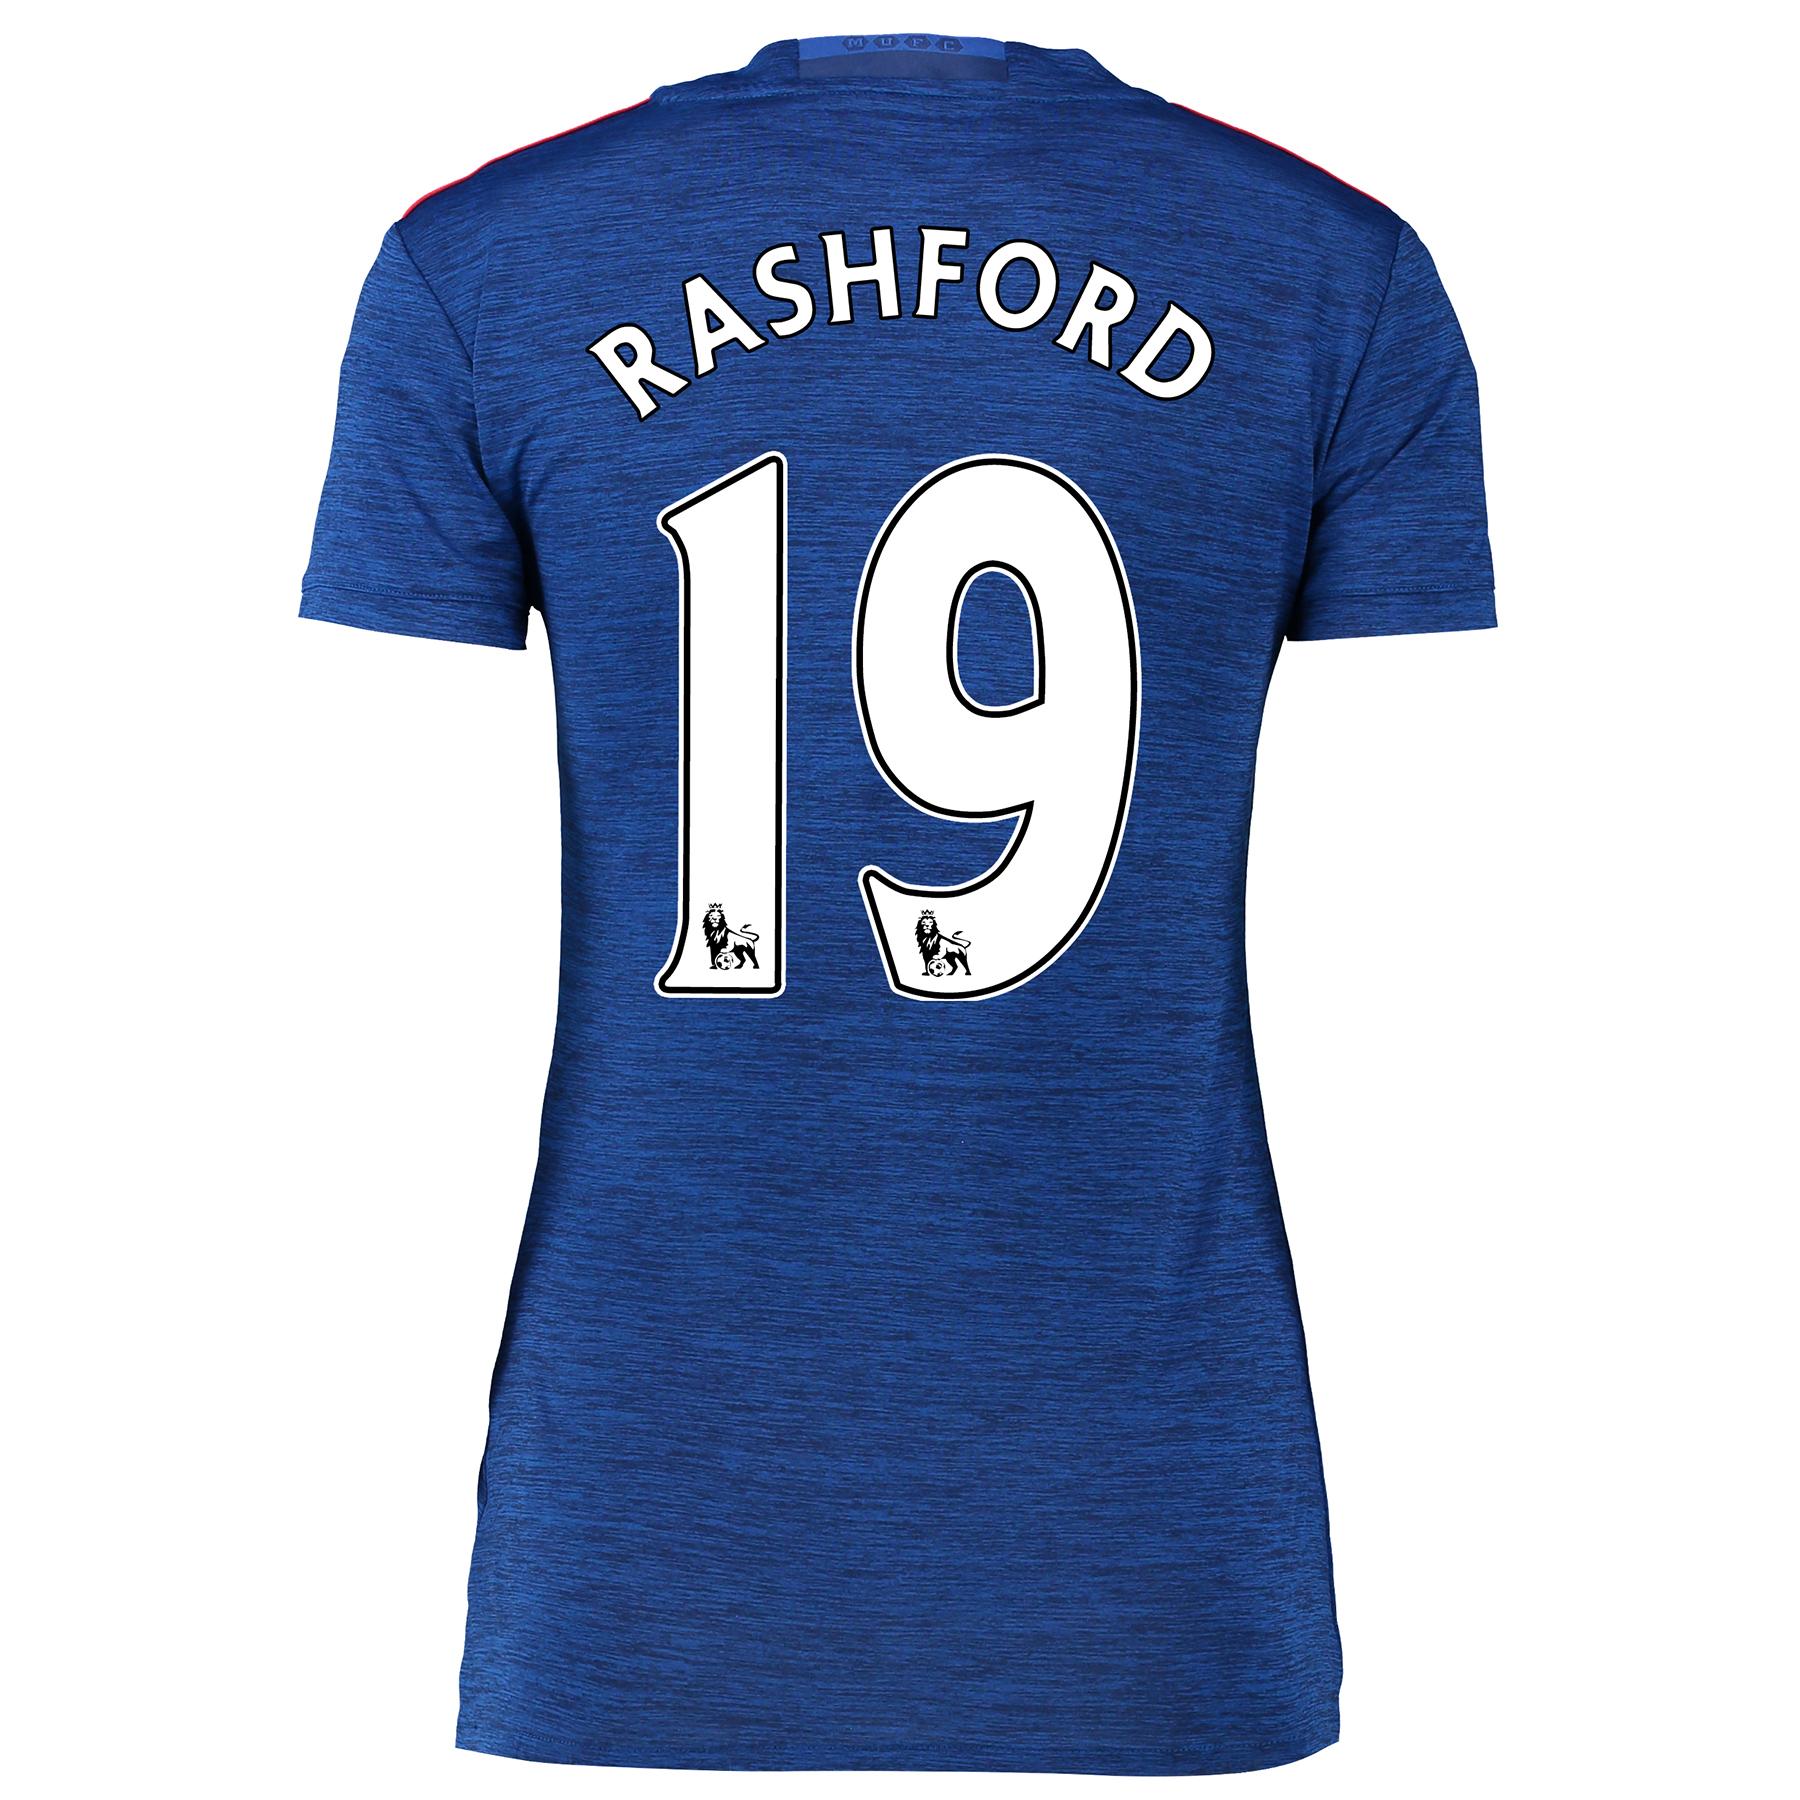 Manchester United Away Shirt 2016-17 - Womens with Rashford 19 printin